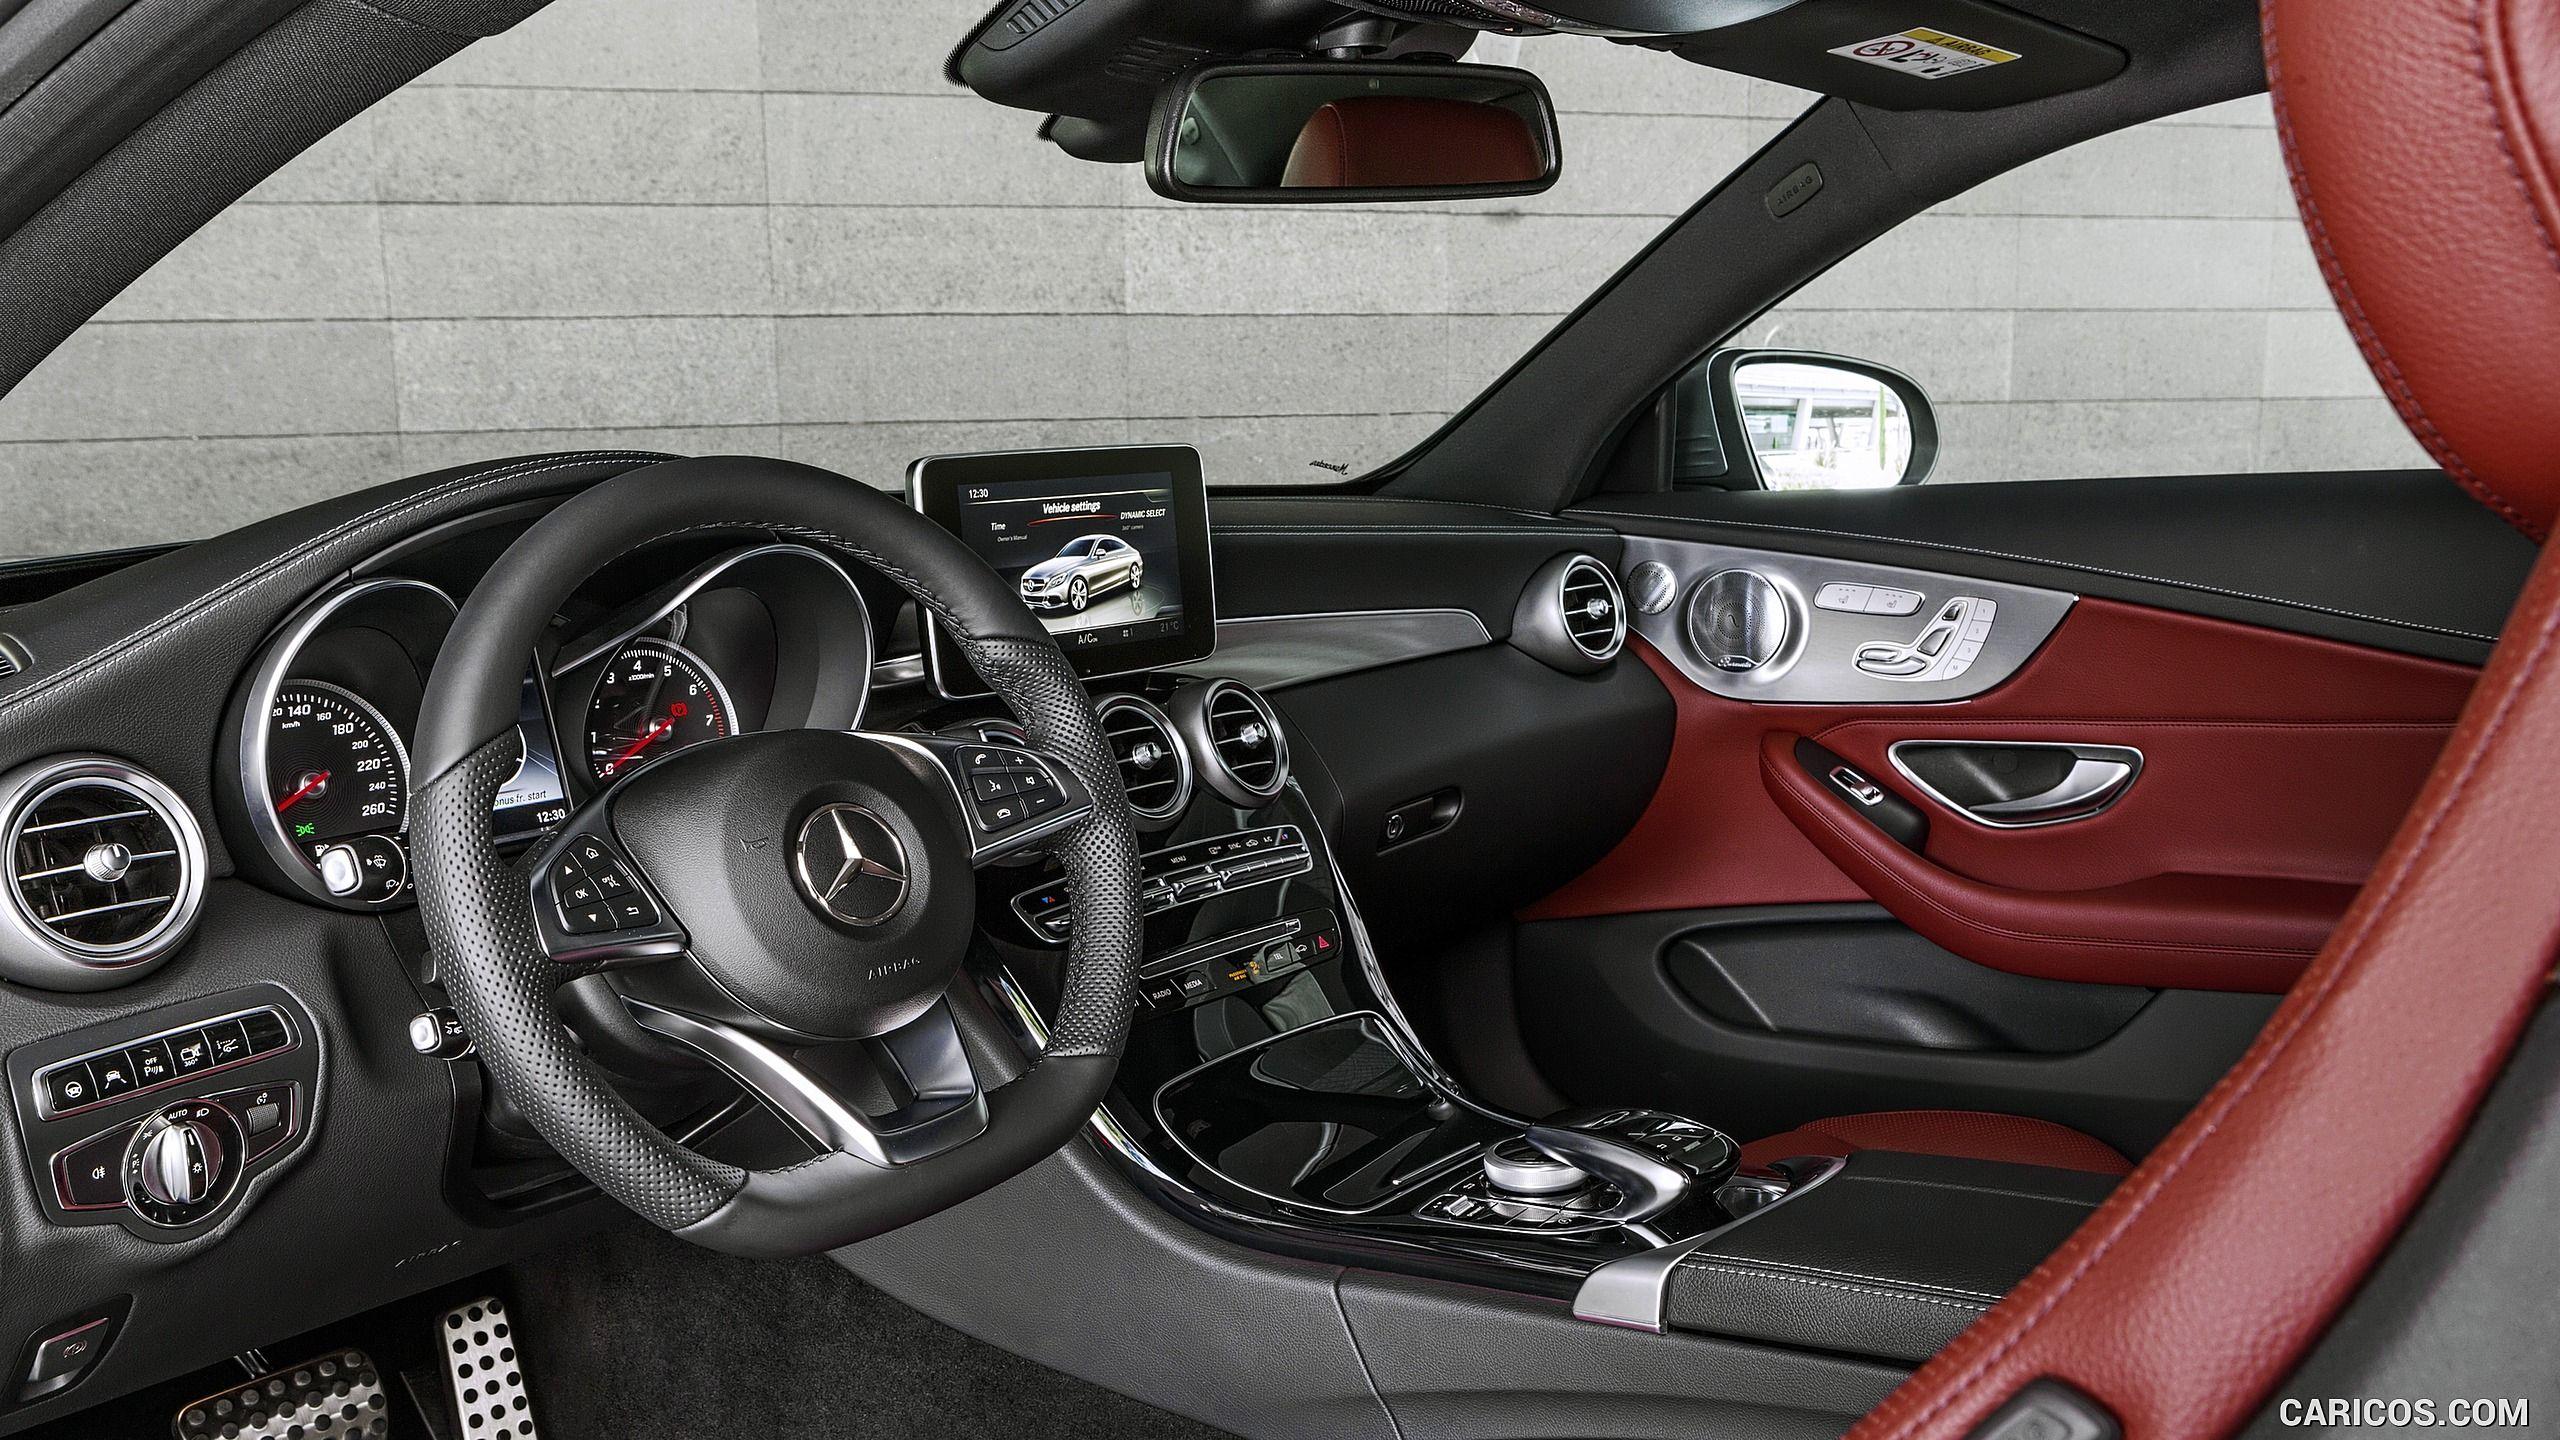 2017 Mercedes Benz C Class Coupe Wallpaper Benz C Mercedes